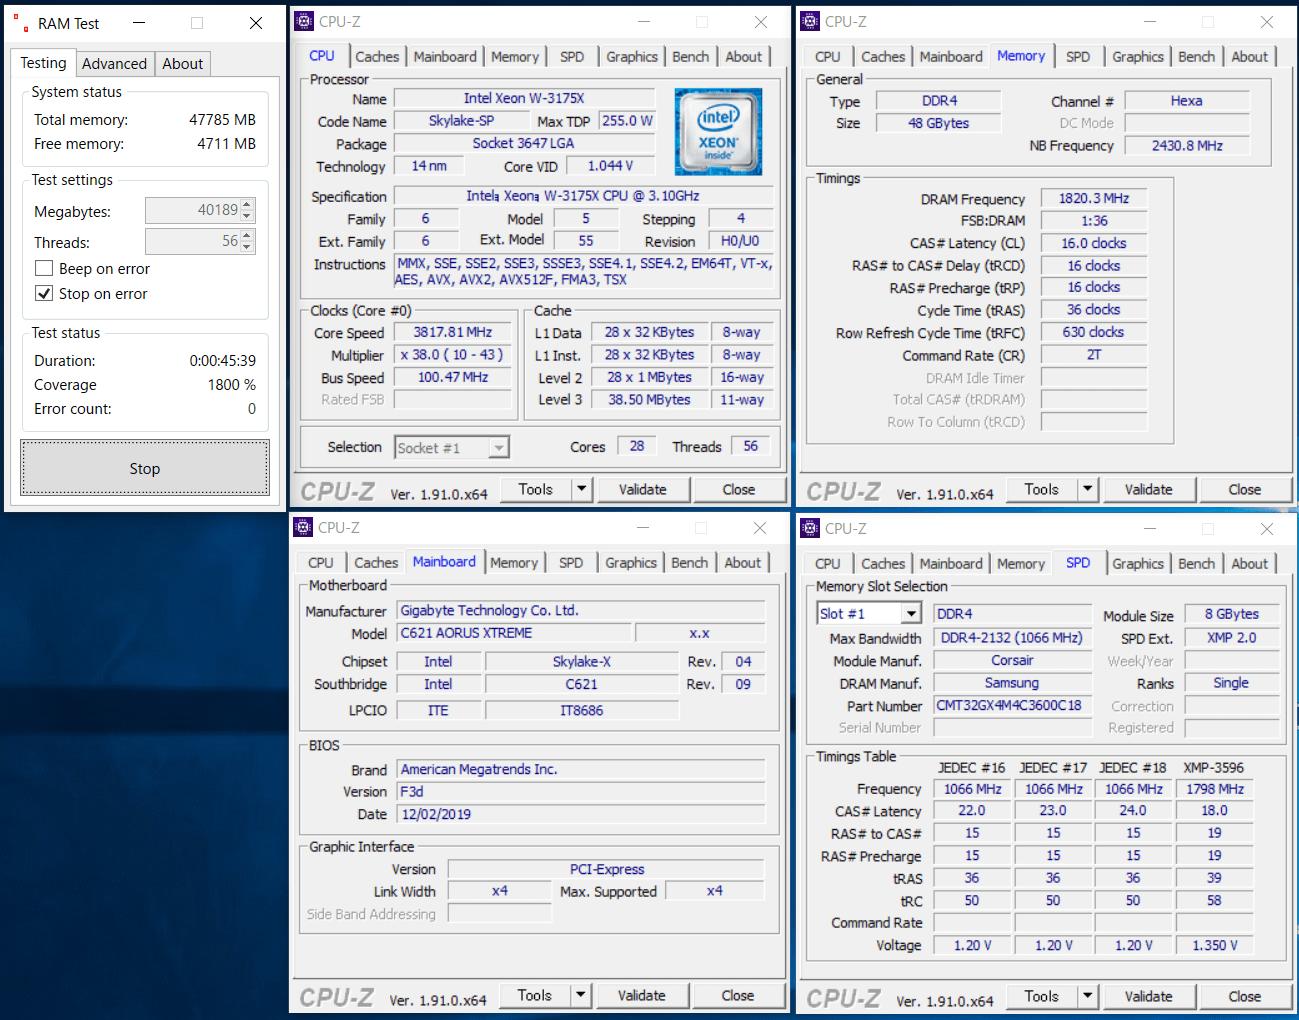 GIGABYTE C621 AORUS XTREME_OC Test_Ramtest